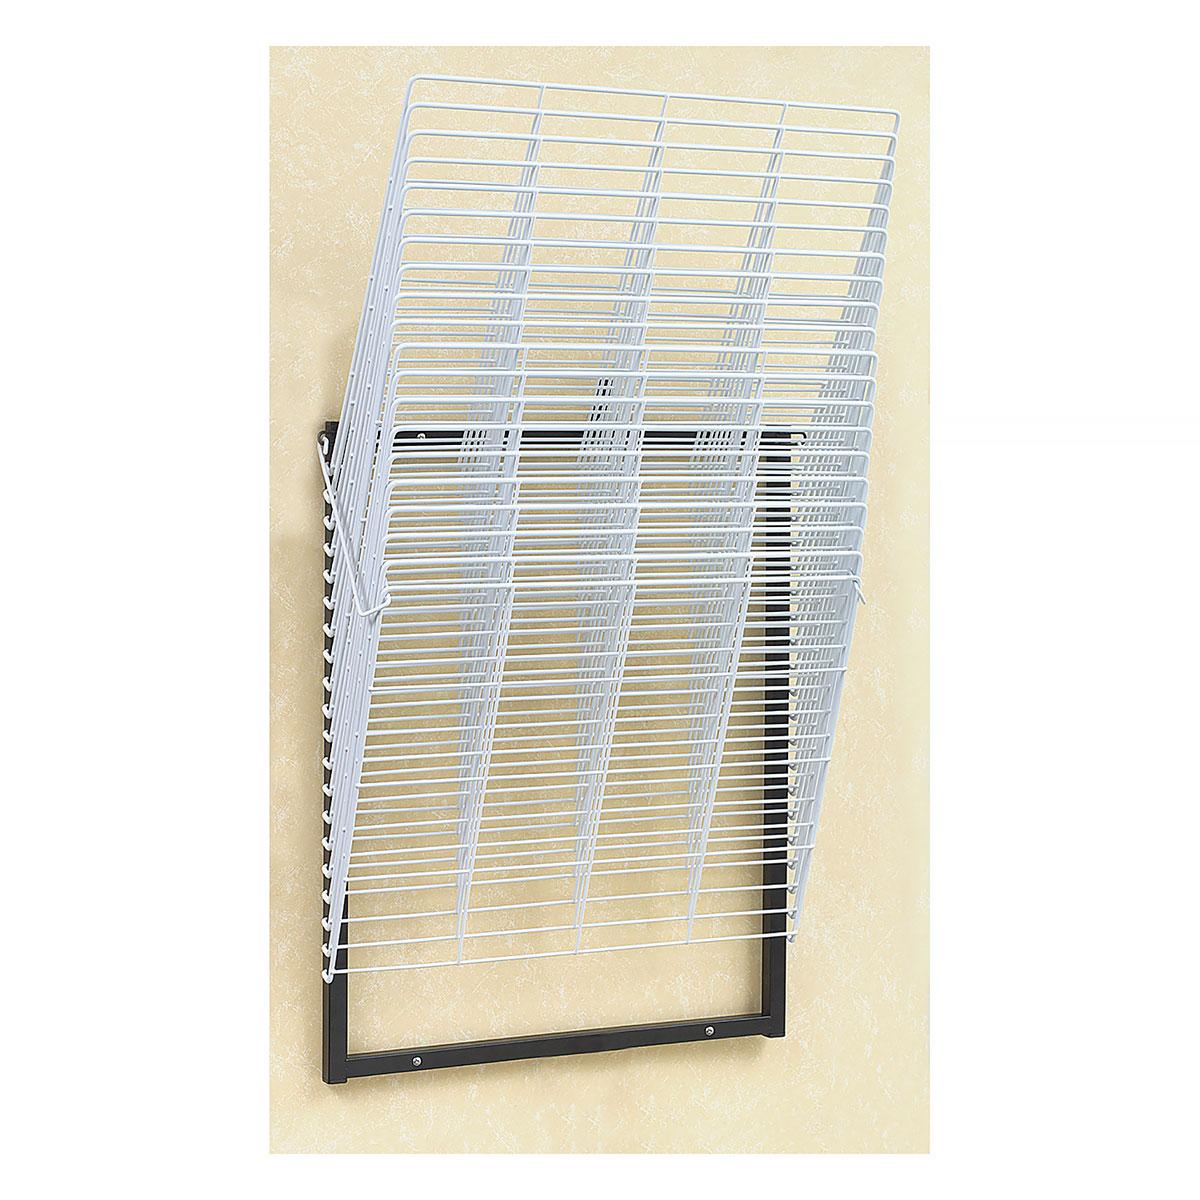 Image of: Drying Racks Blick Art Materials